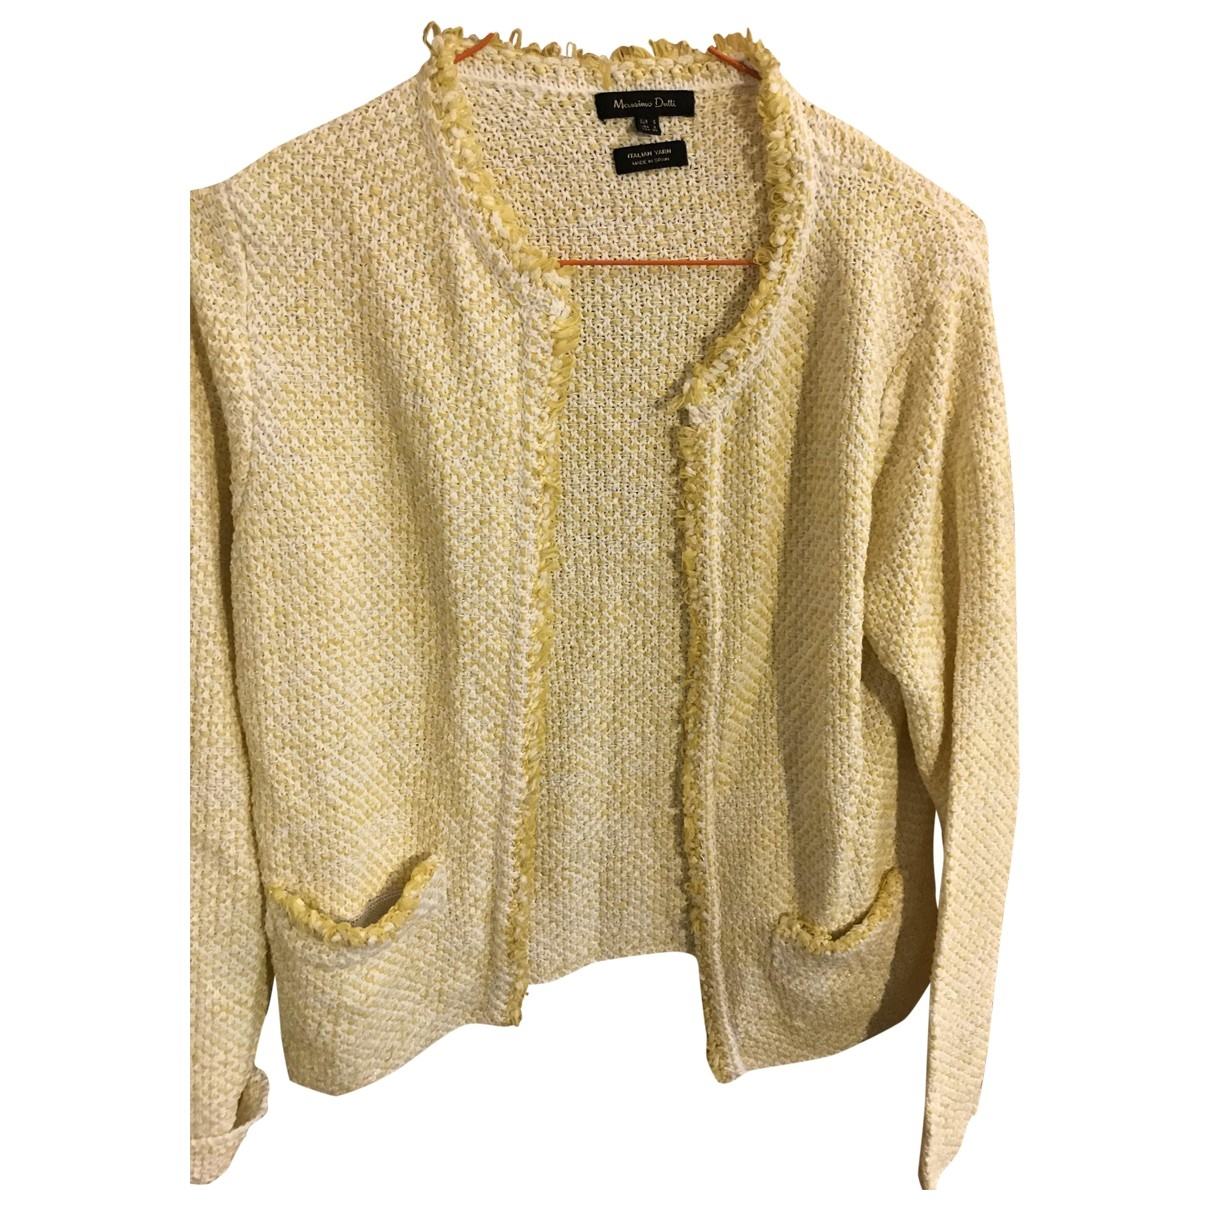 Massimo Dutti - Veste   pour femme en tweed - jaune